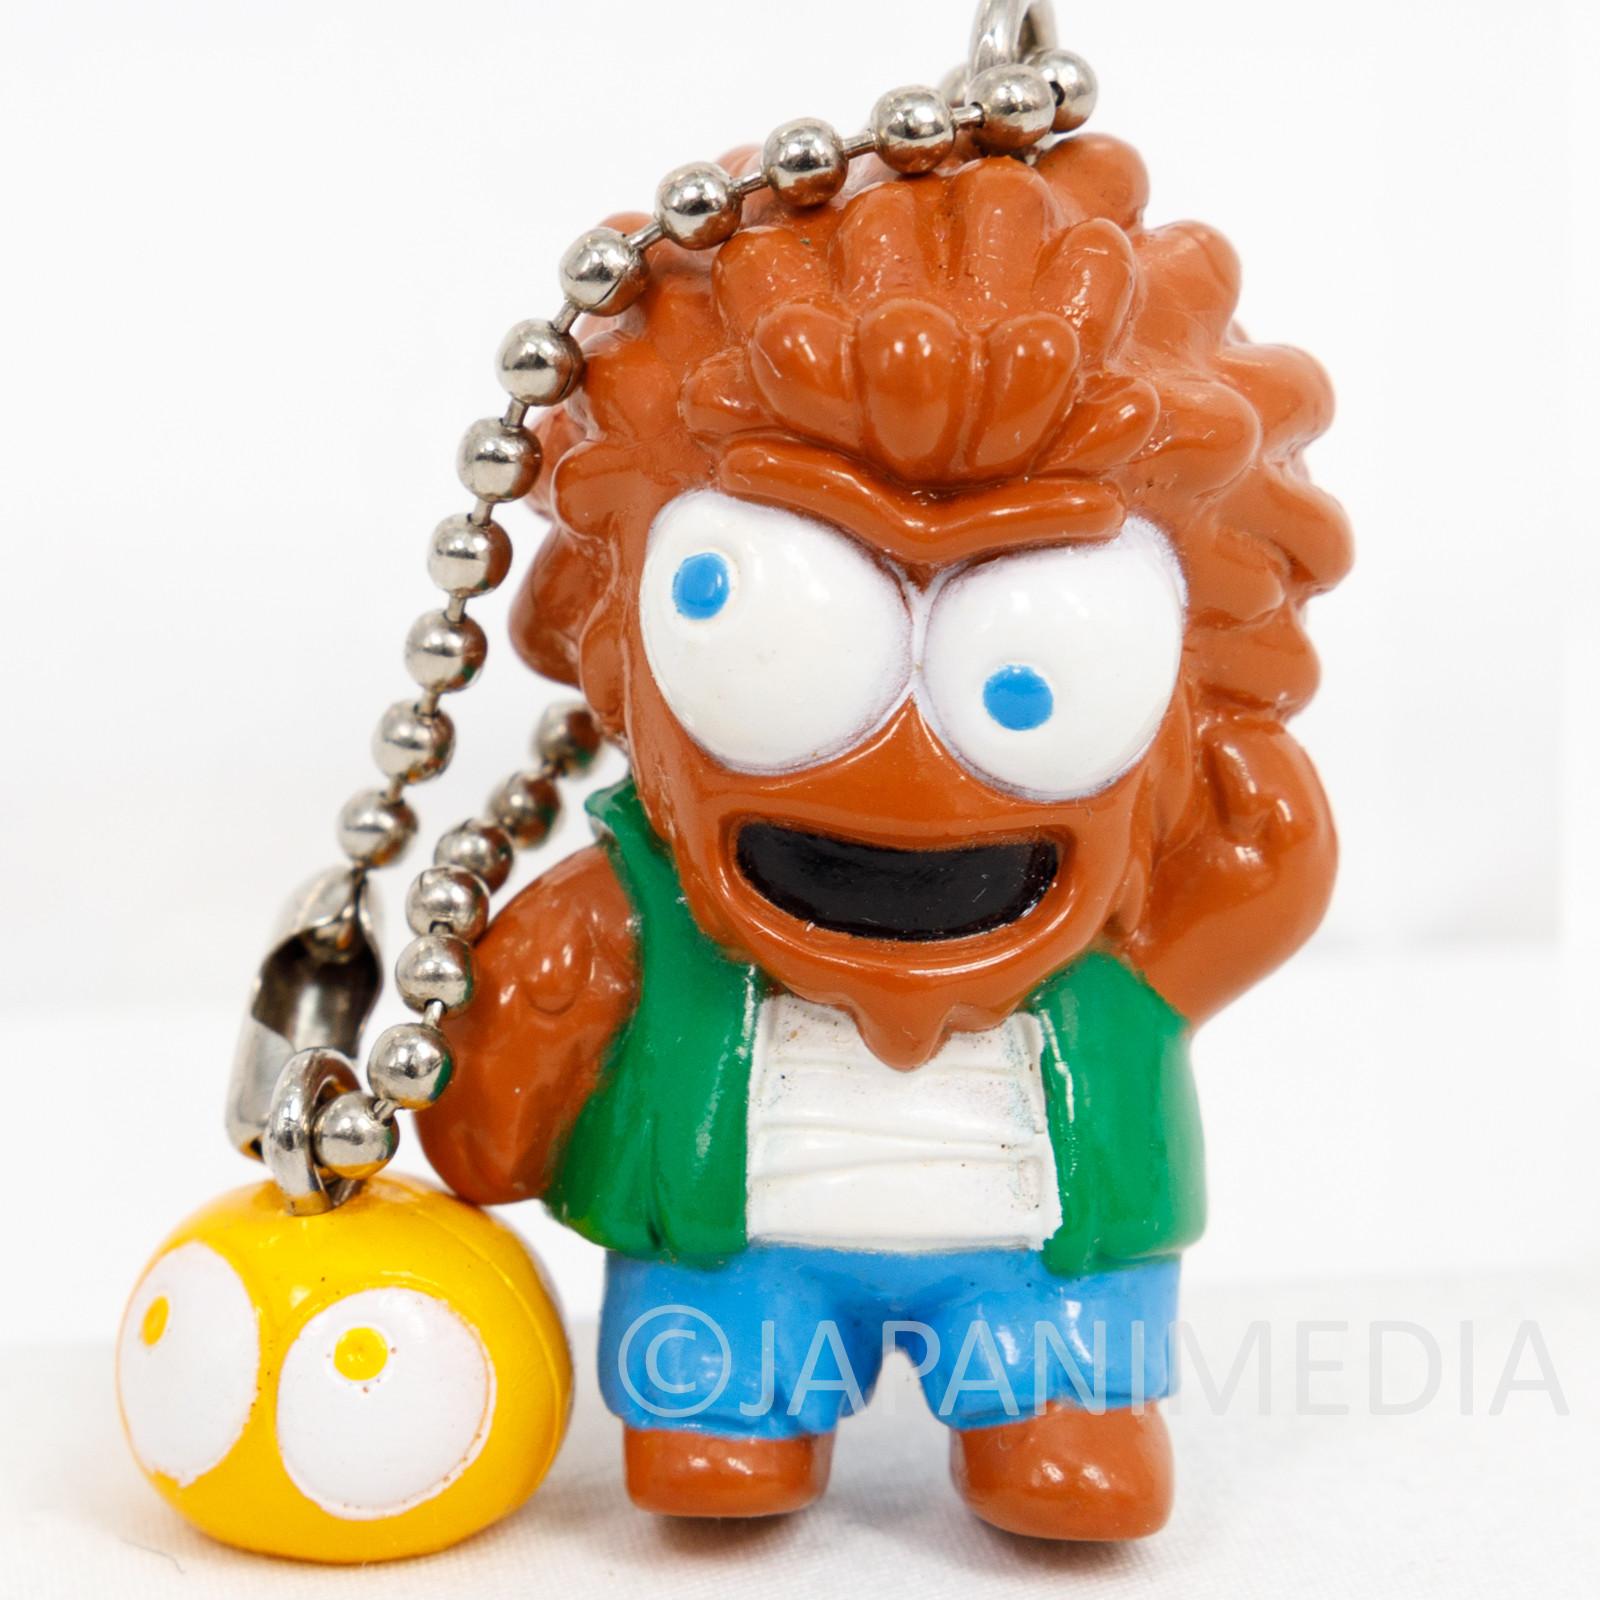 Retro RARE PUYO PUYO Zombie Figure Keychain JAPAN FAME SEGA